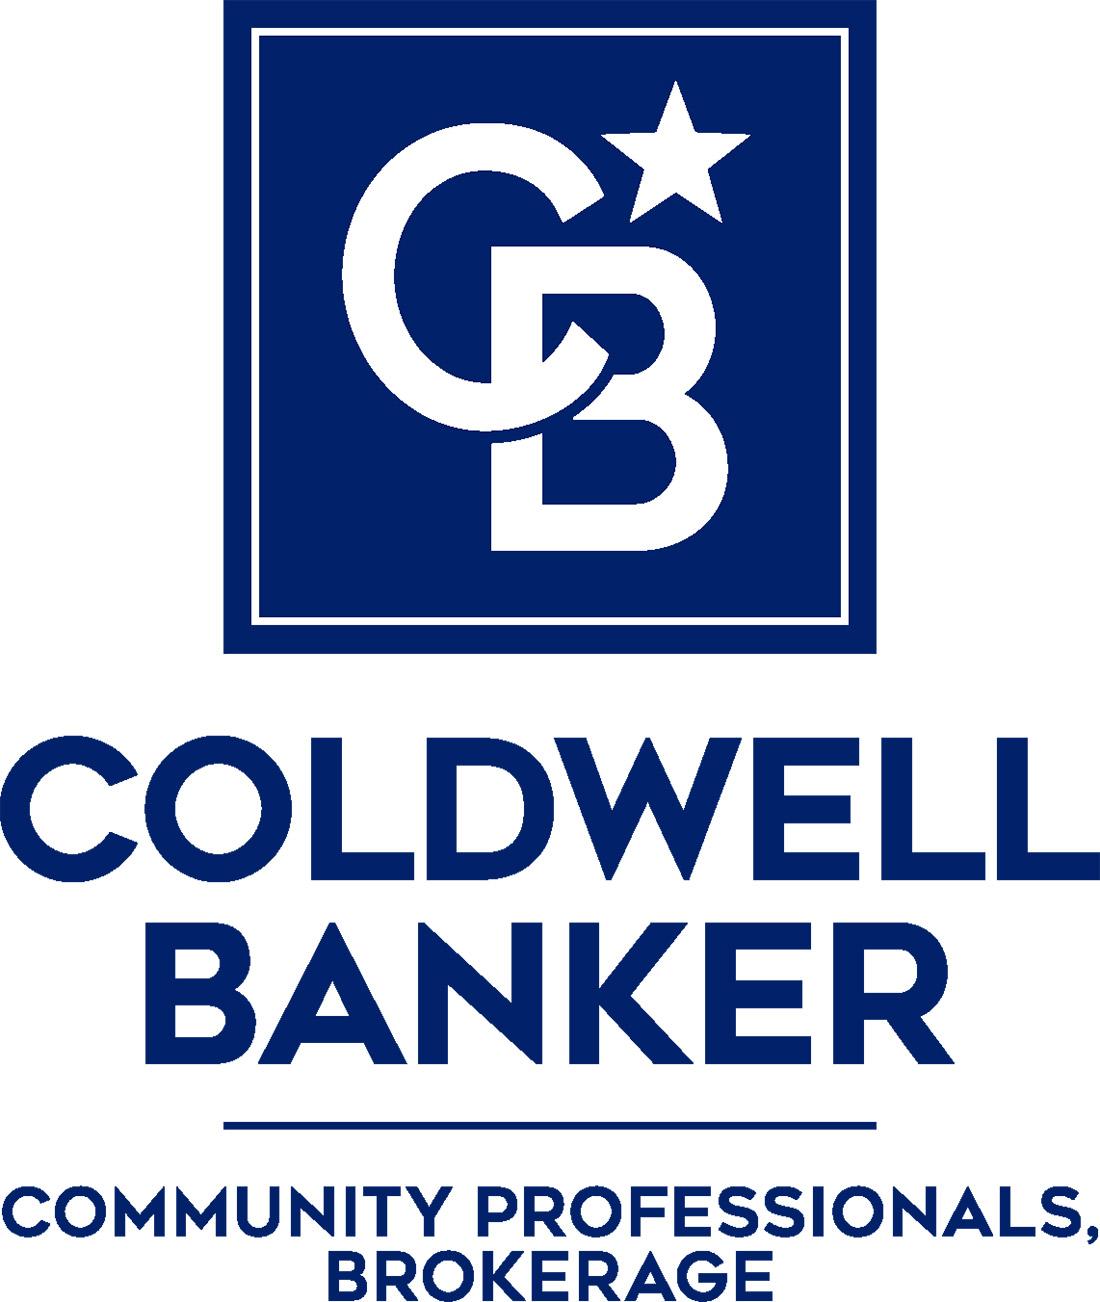 Meltem Koseleci - Coldwell Banker Community Professionals Logo